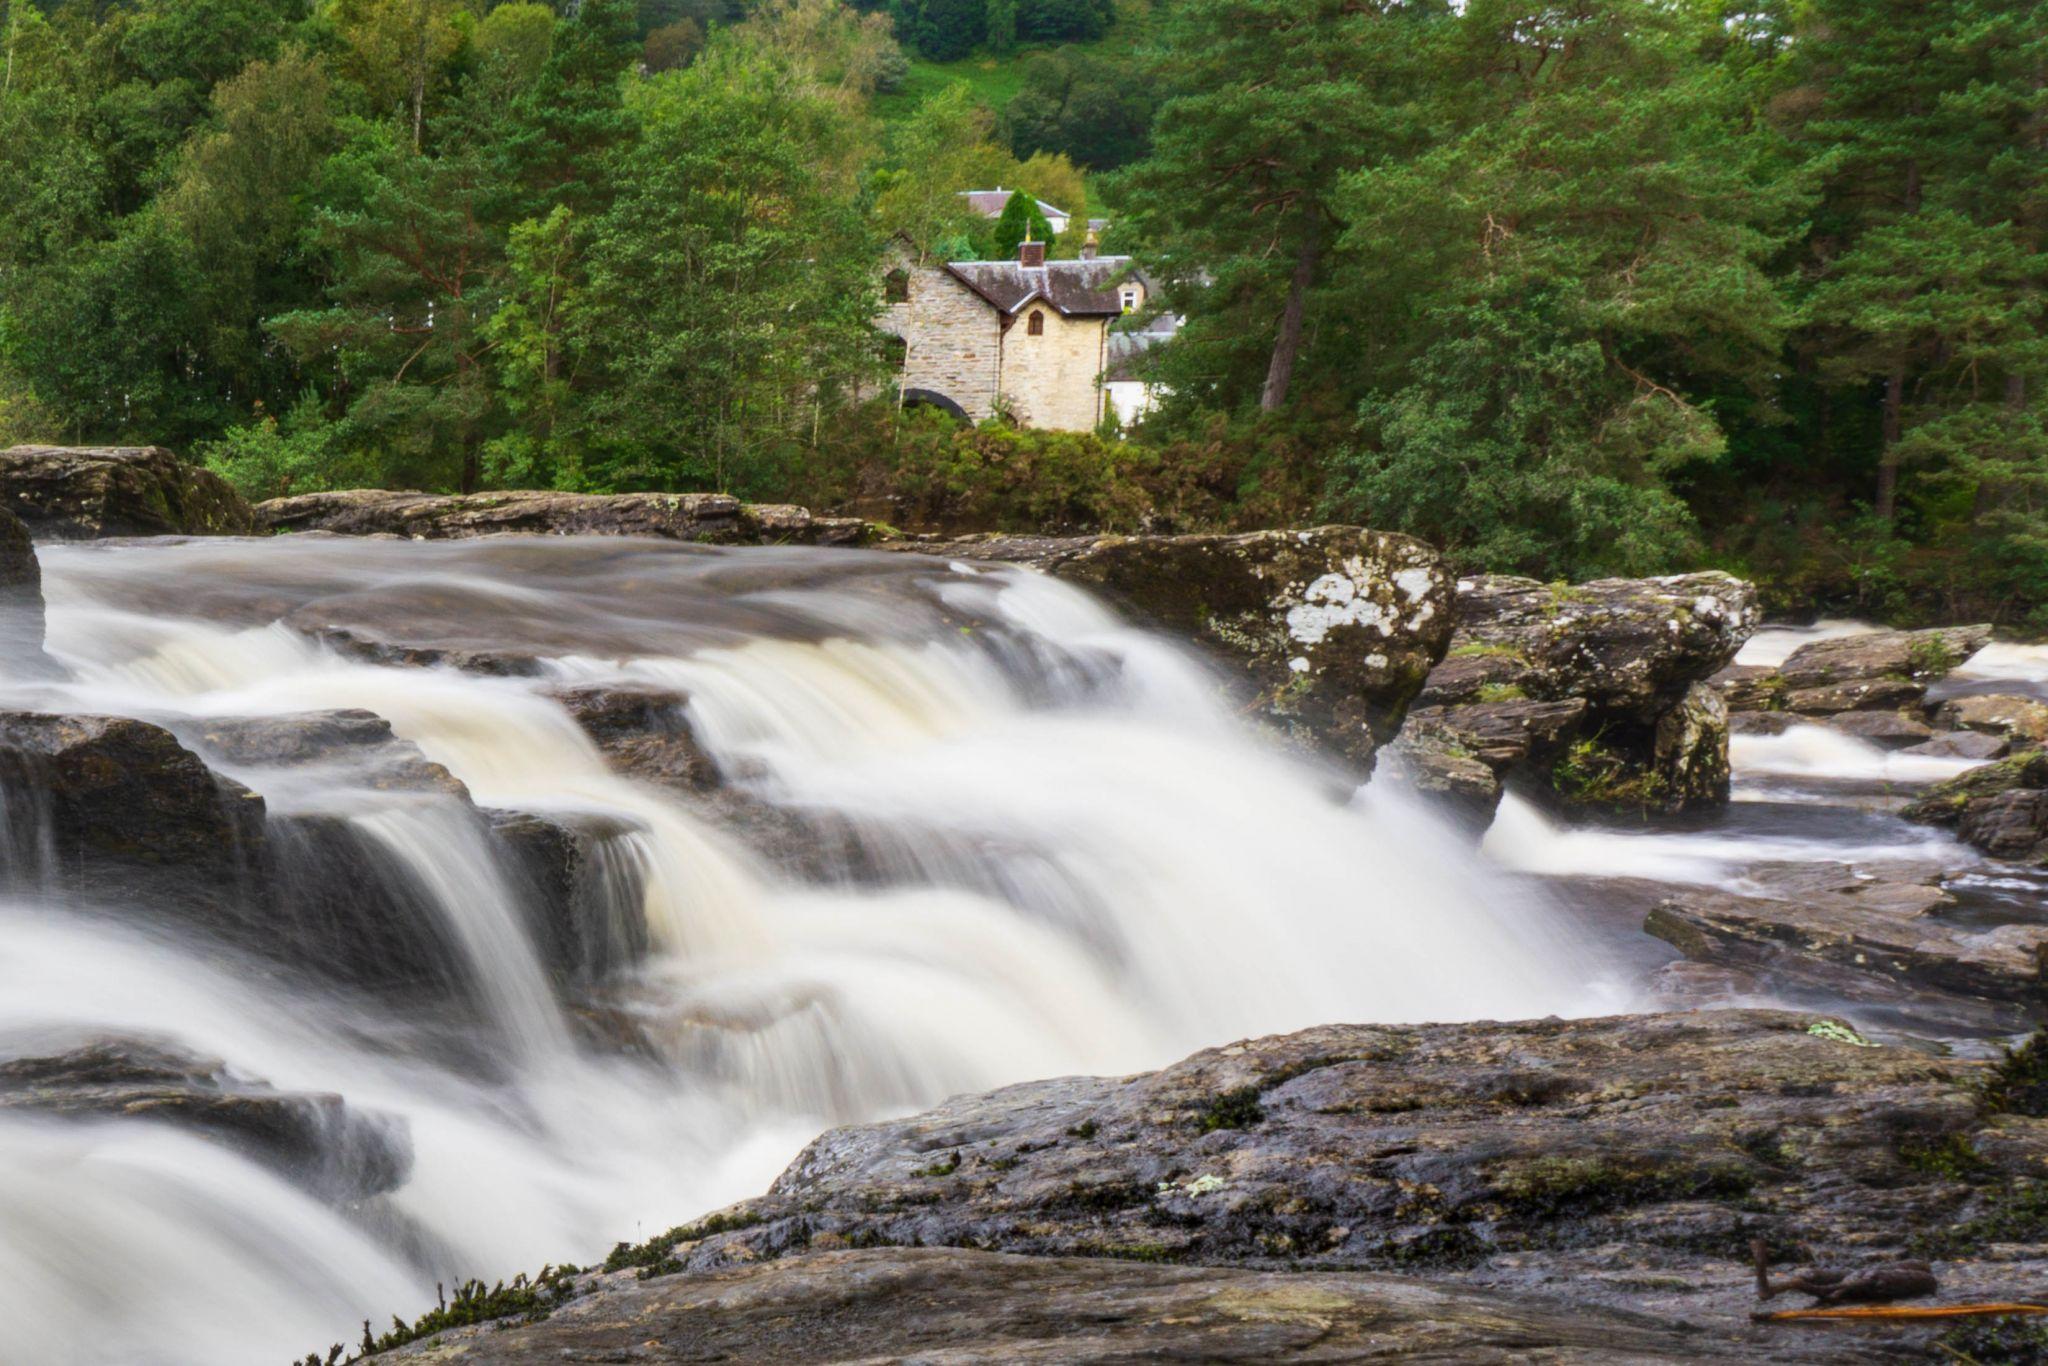 Falls of Dochart, United Kingdom